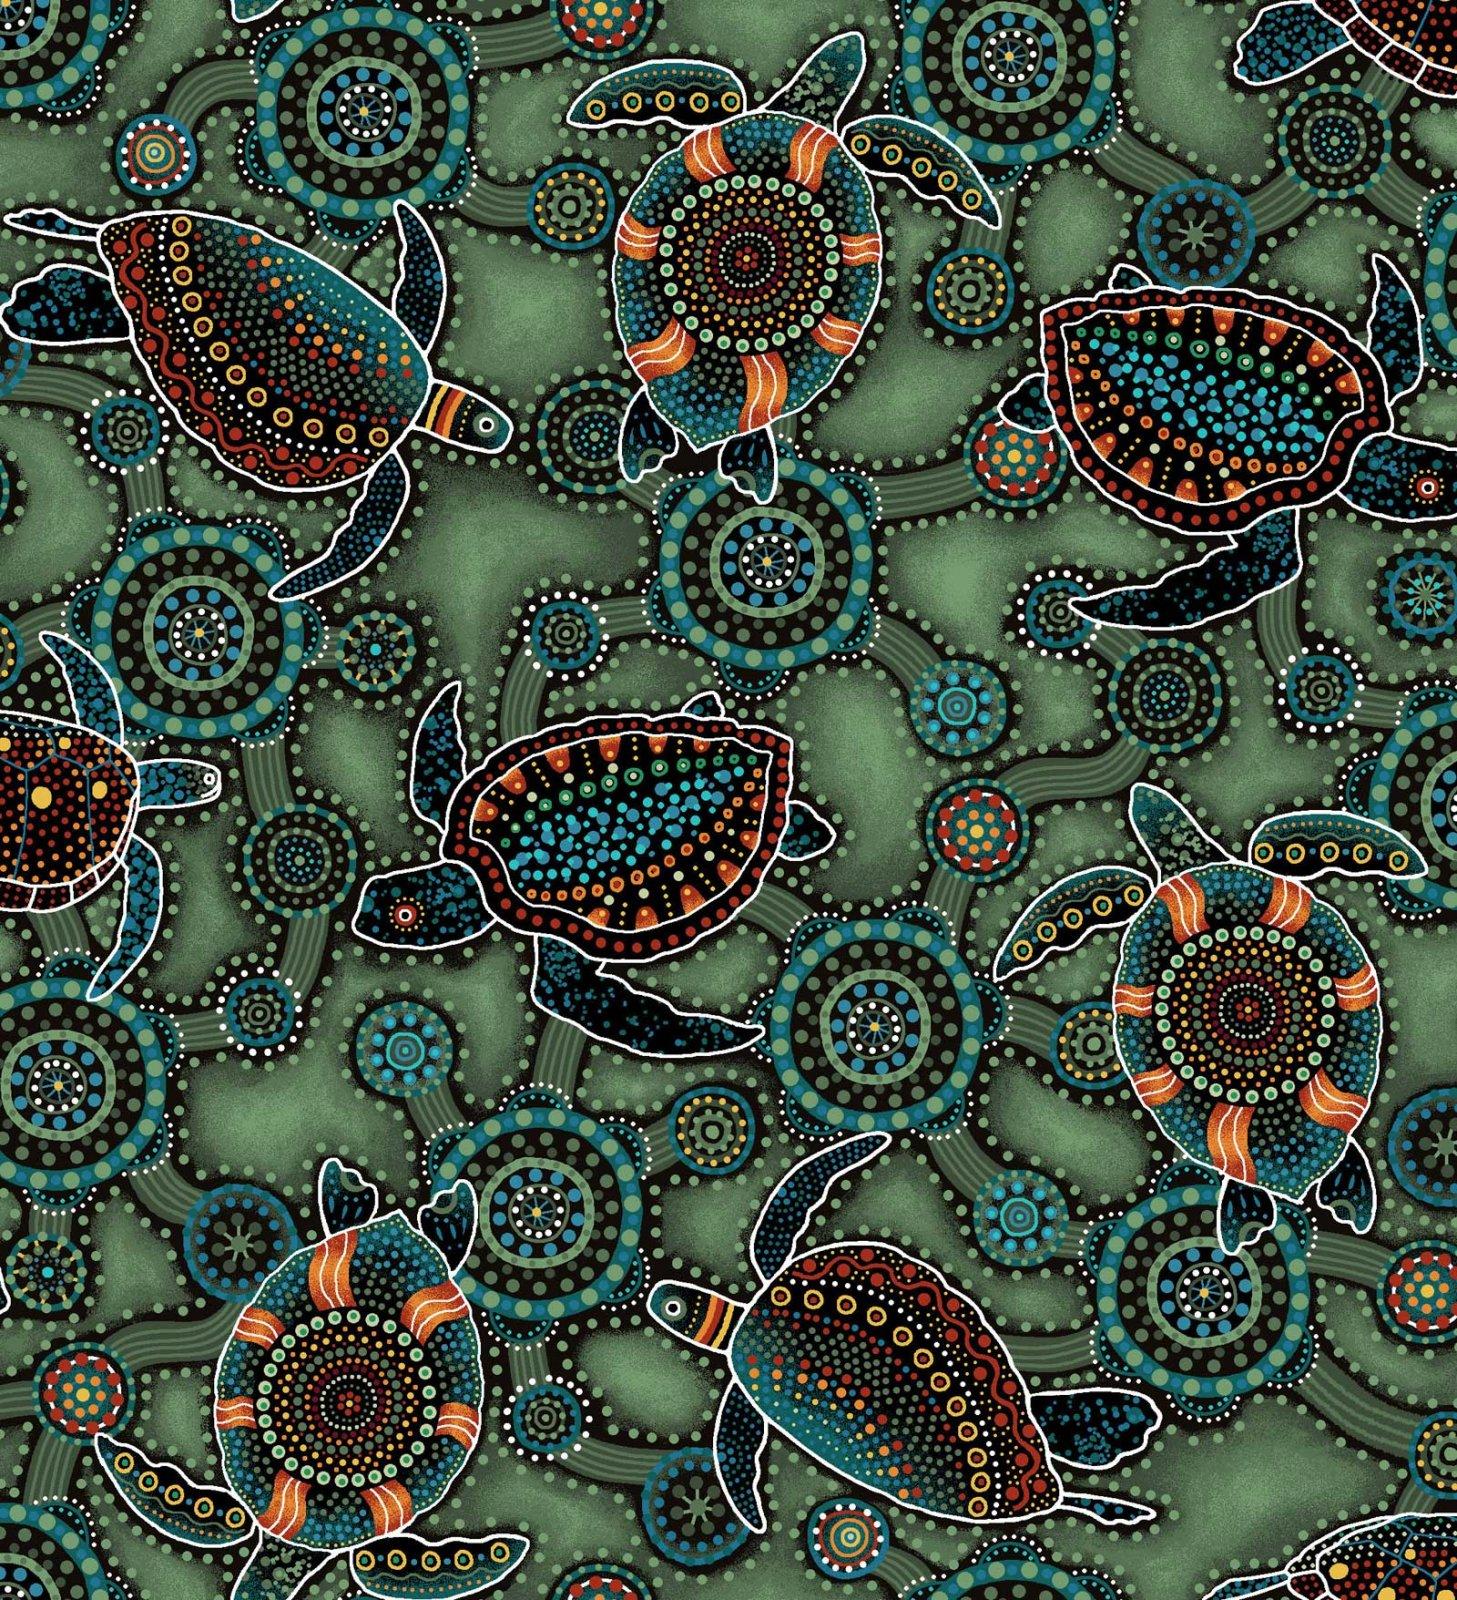 Down Under Aboriginal Sea Turtles - Green